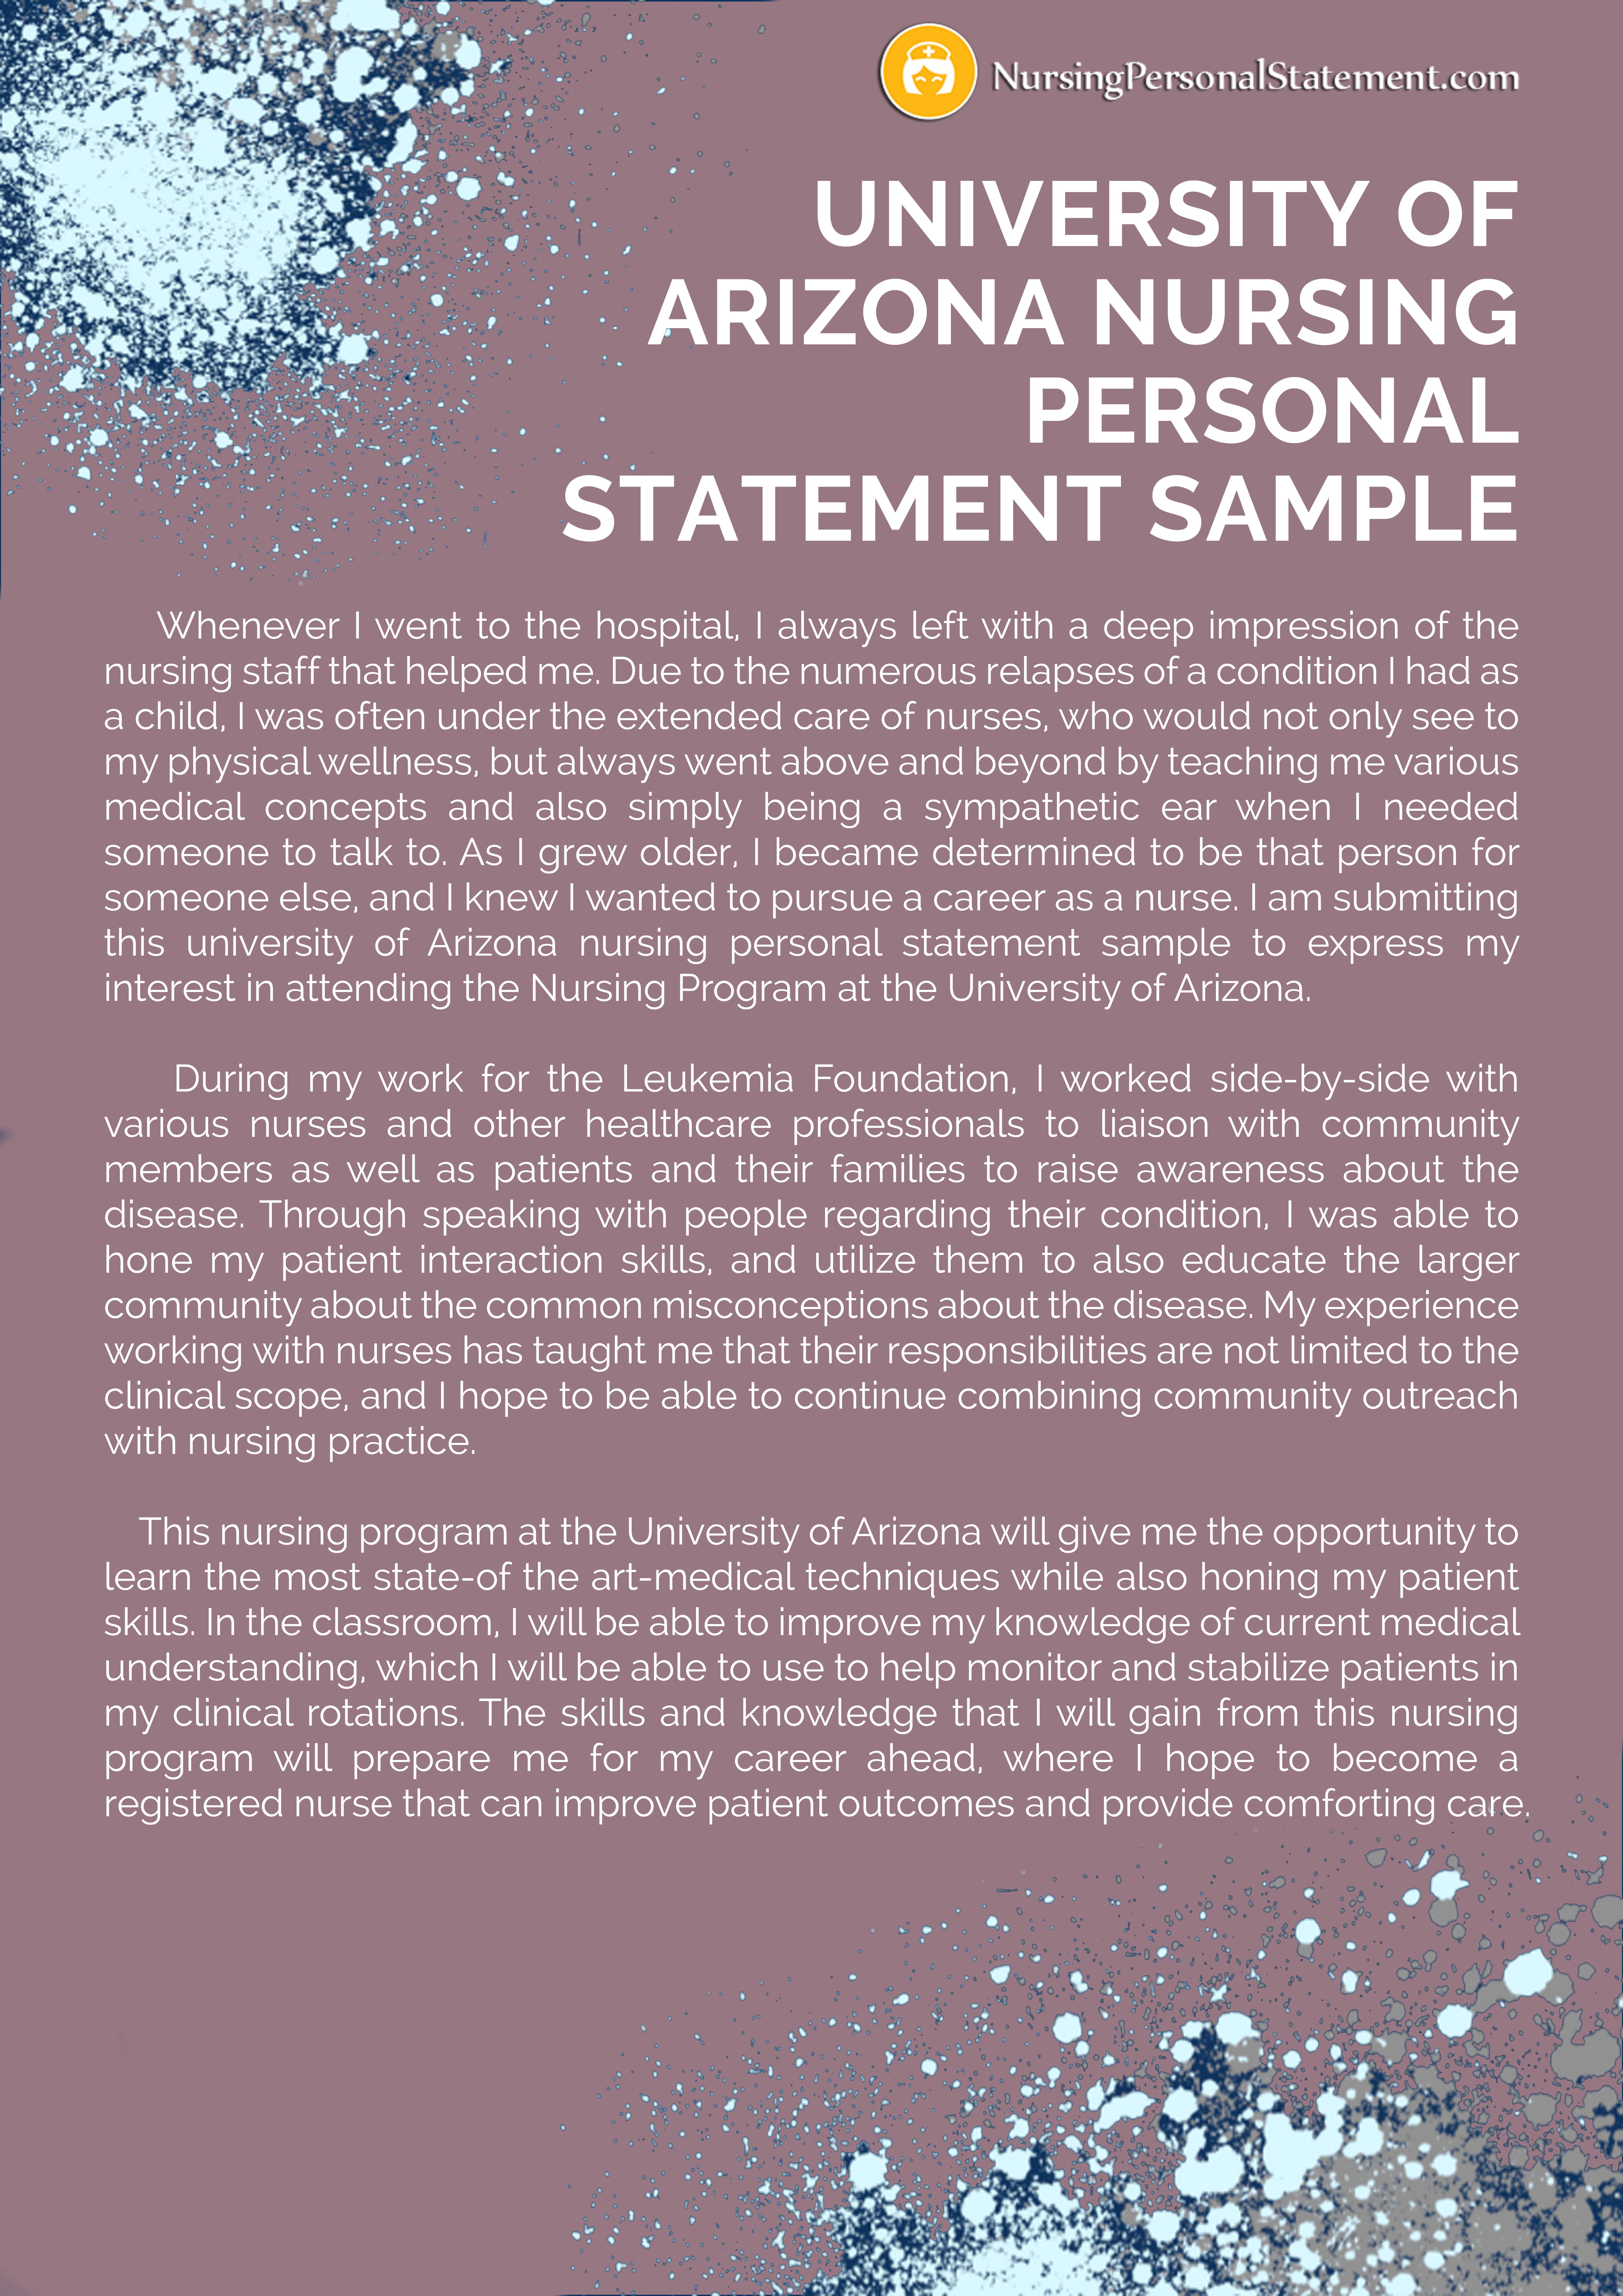 University Of Arizona Nursing Personal Statement Sample Scholarship Essay Examples For